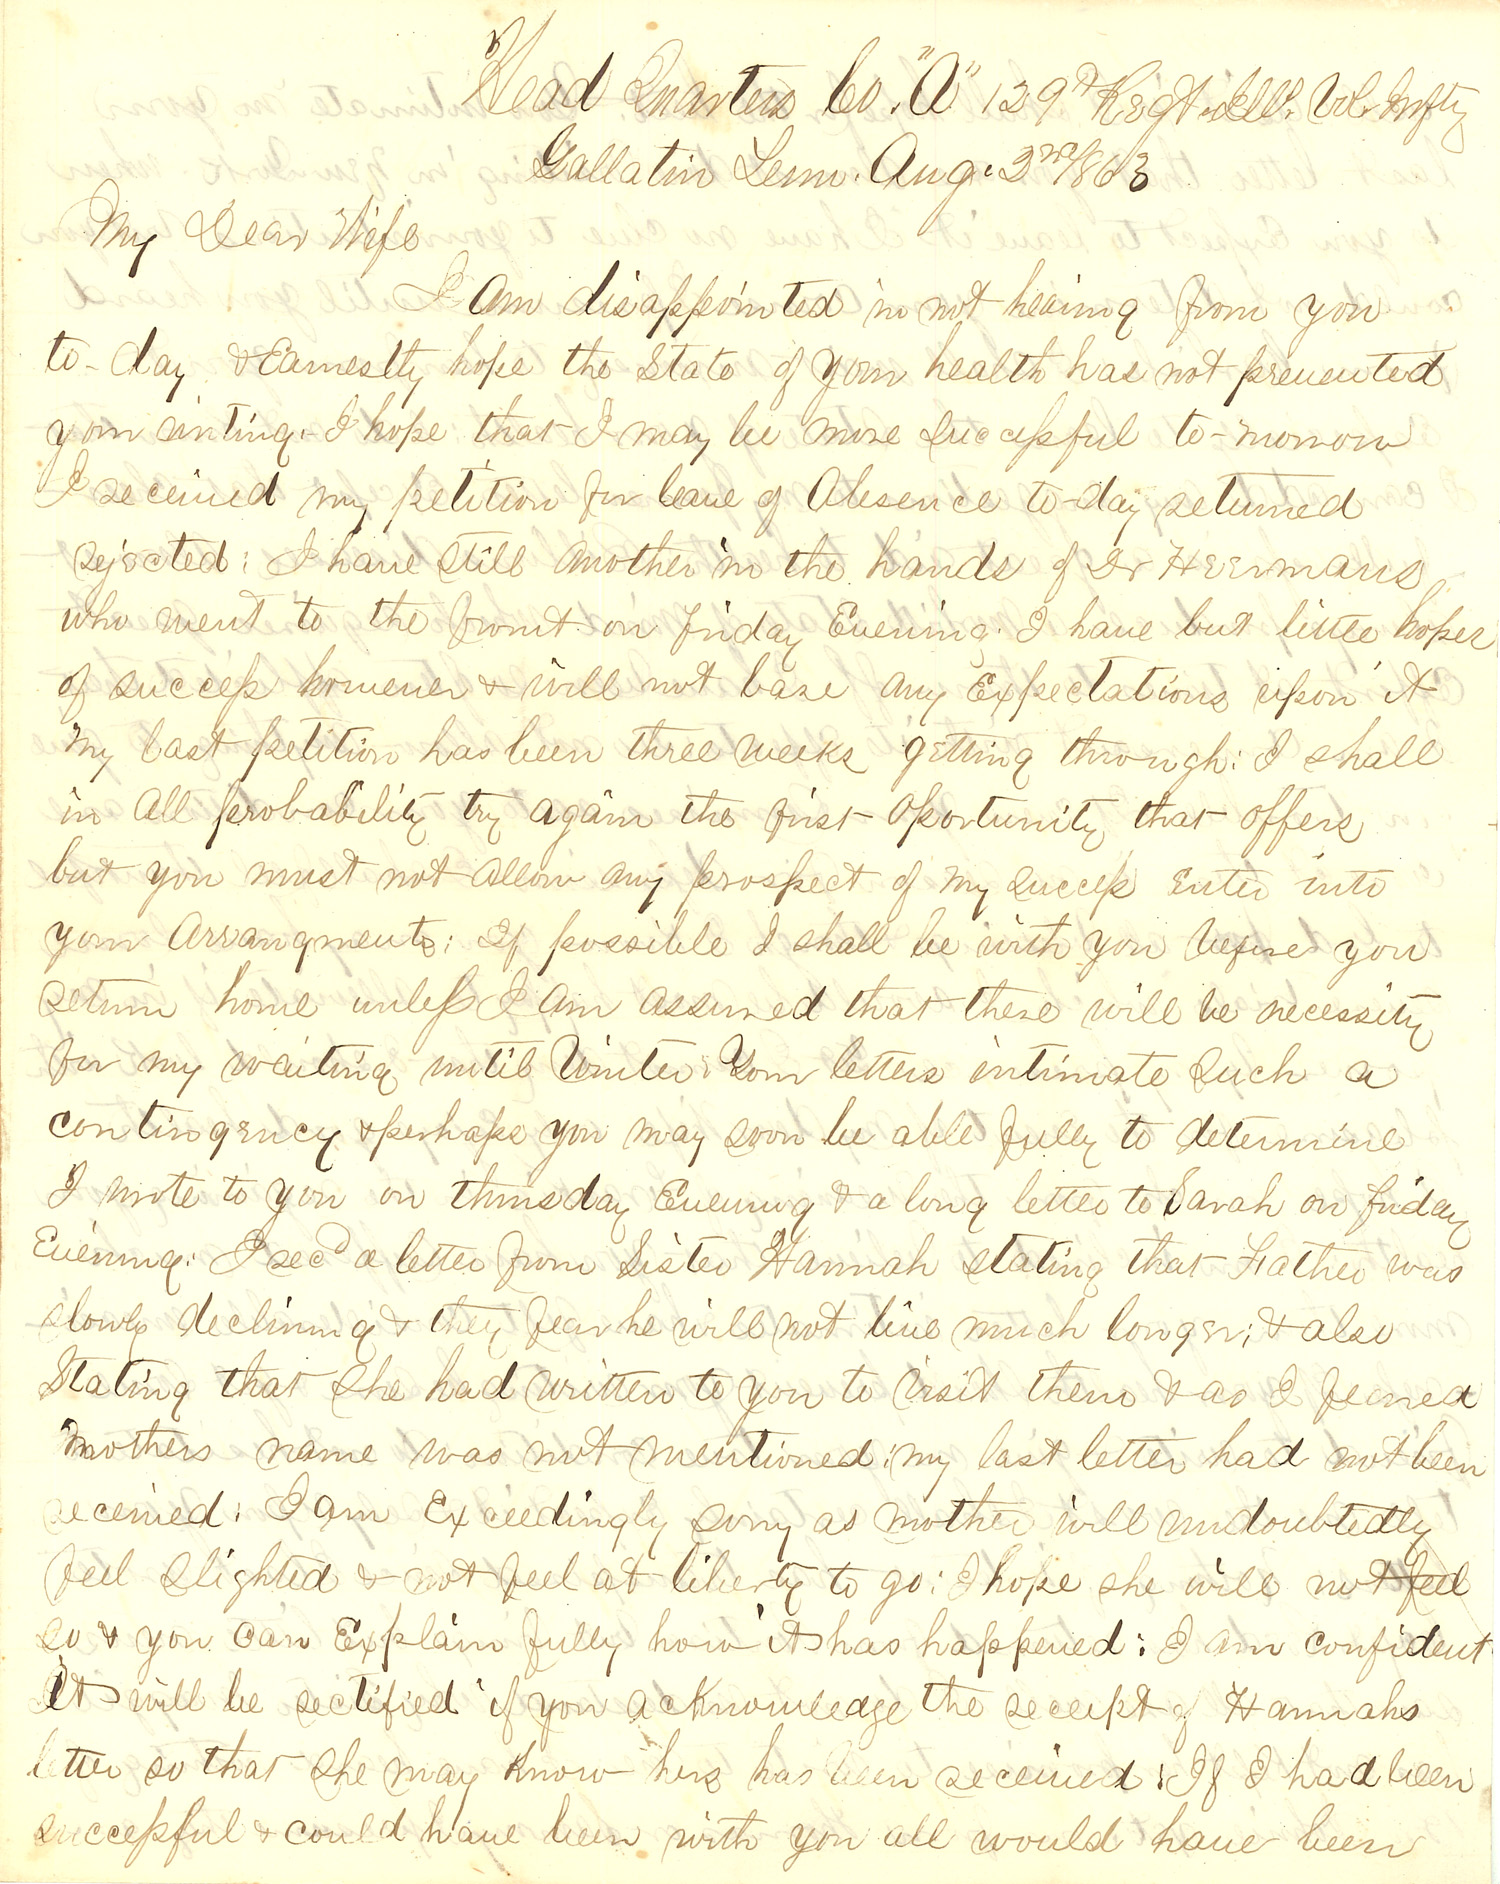 Joseph Culver Letter, August 2, 1863, Page 1